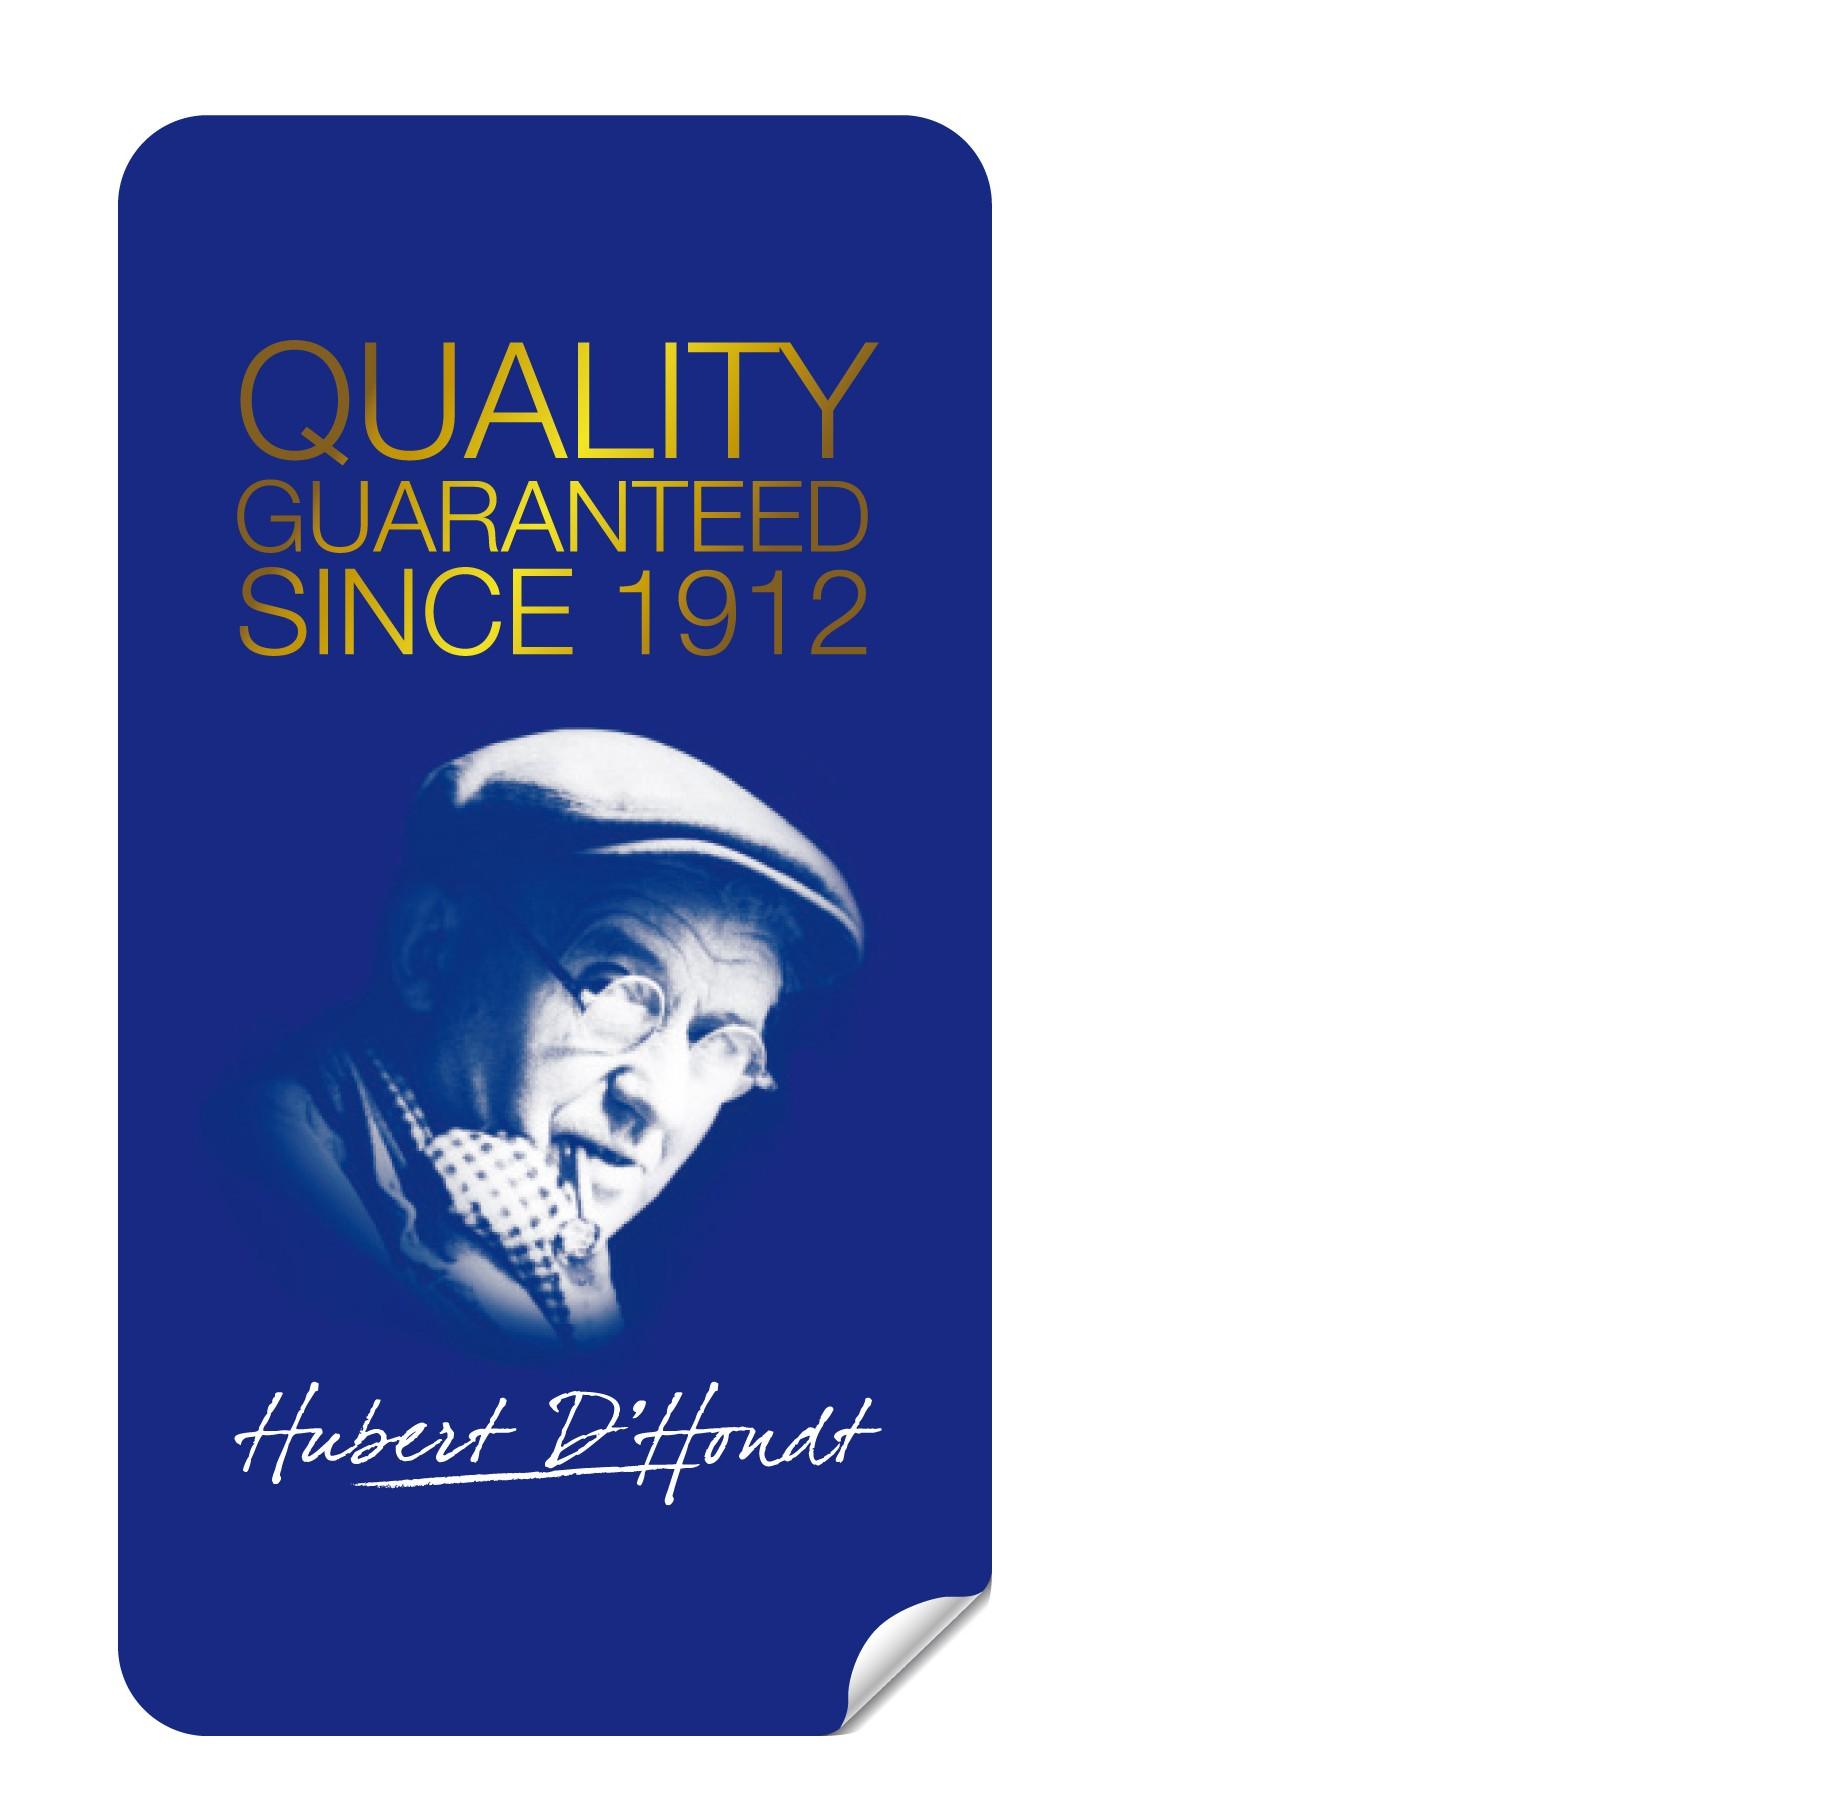 Quality_Hubert